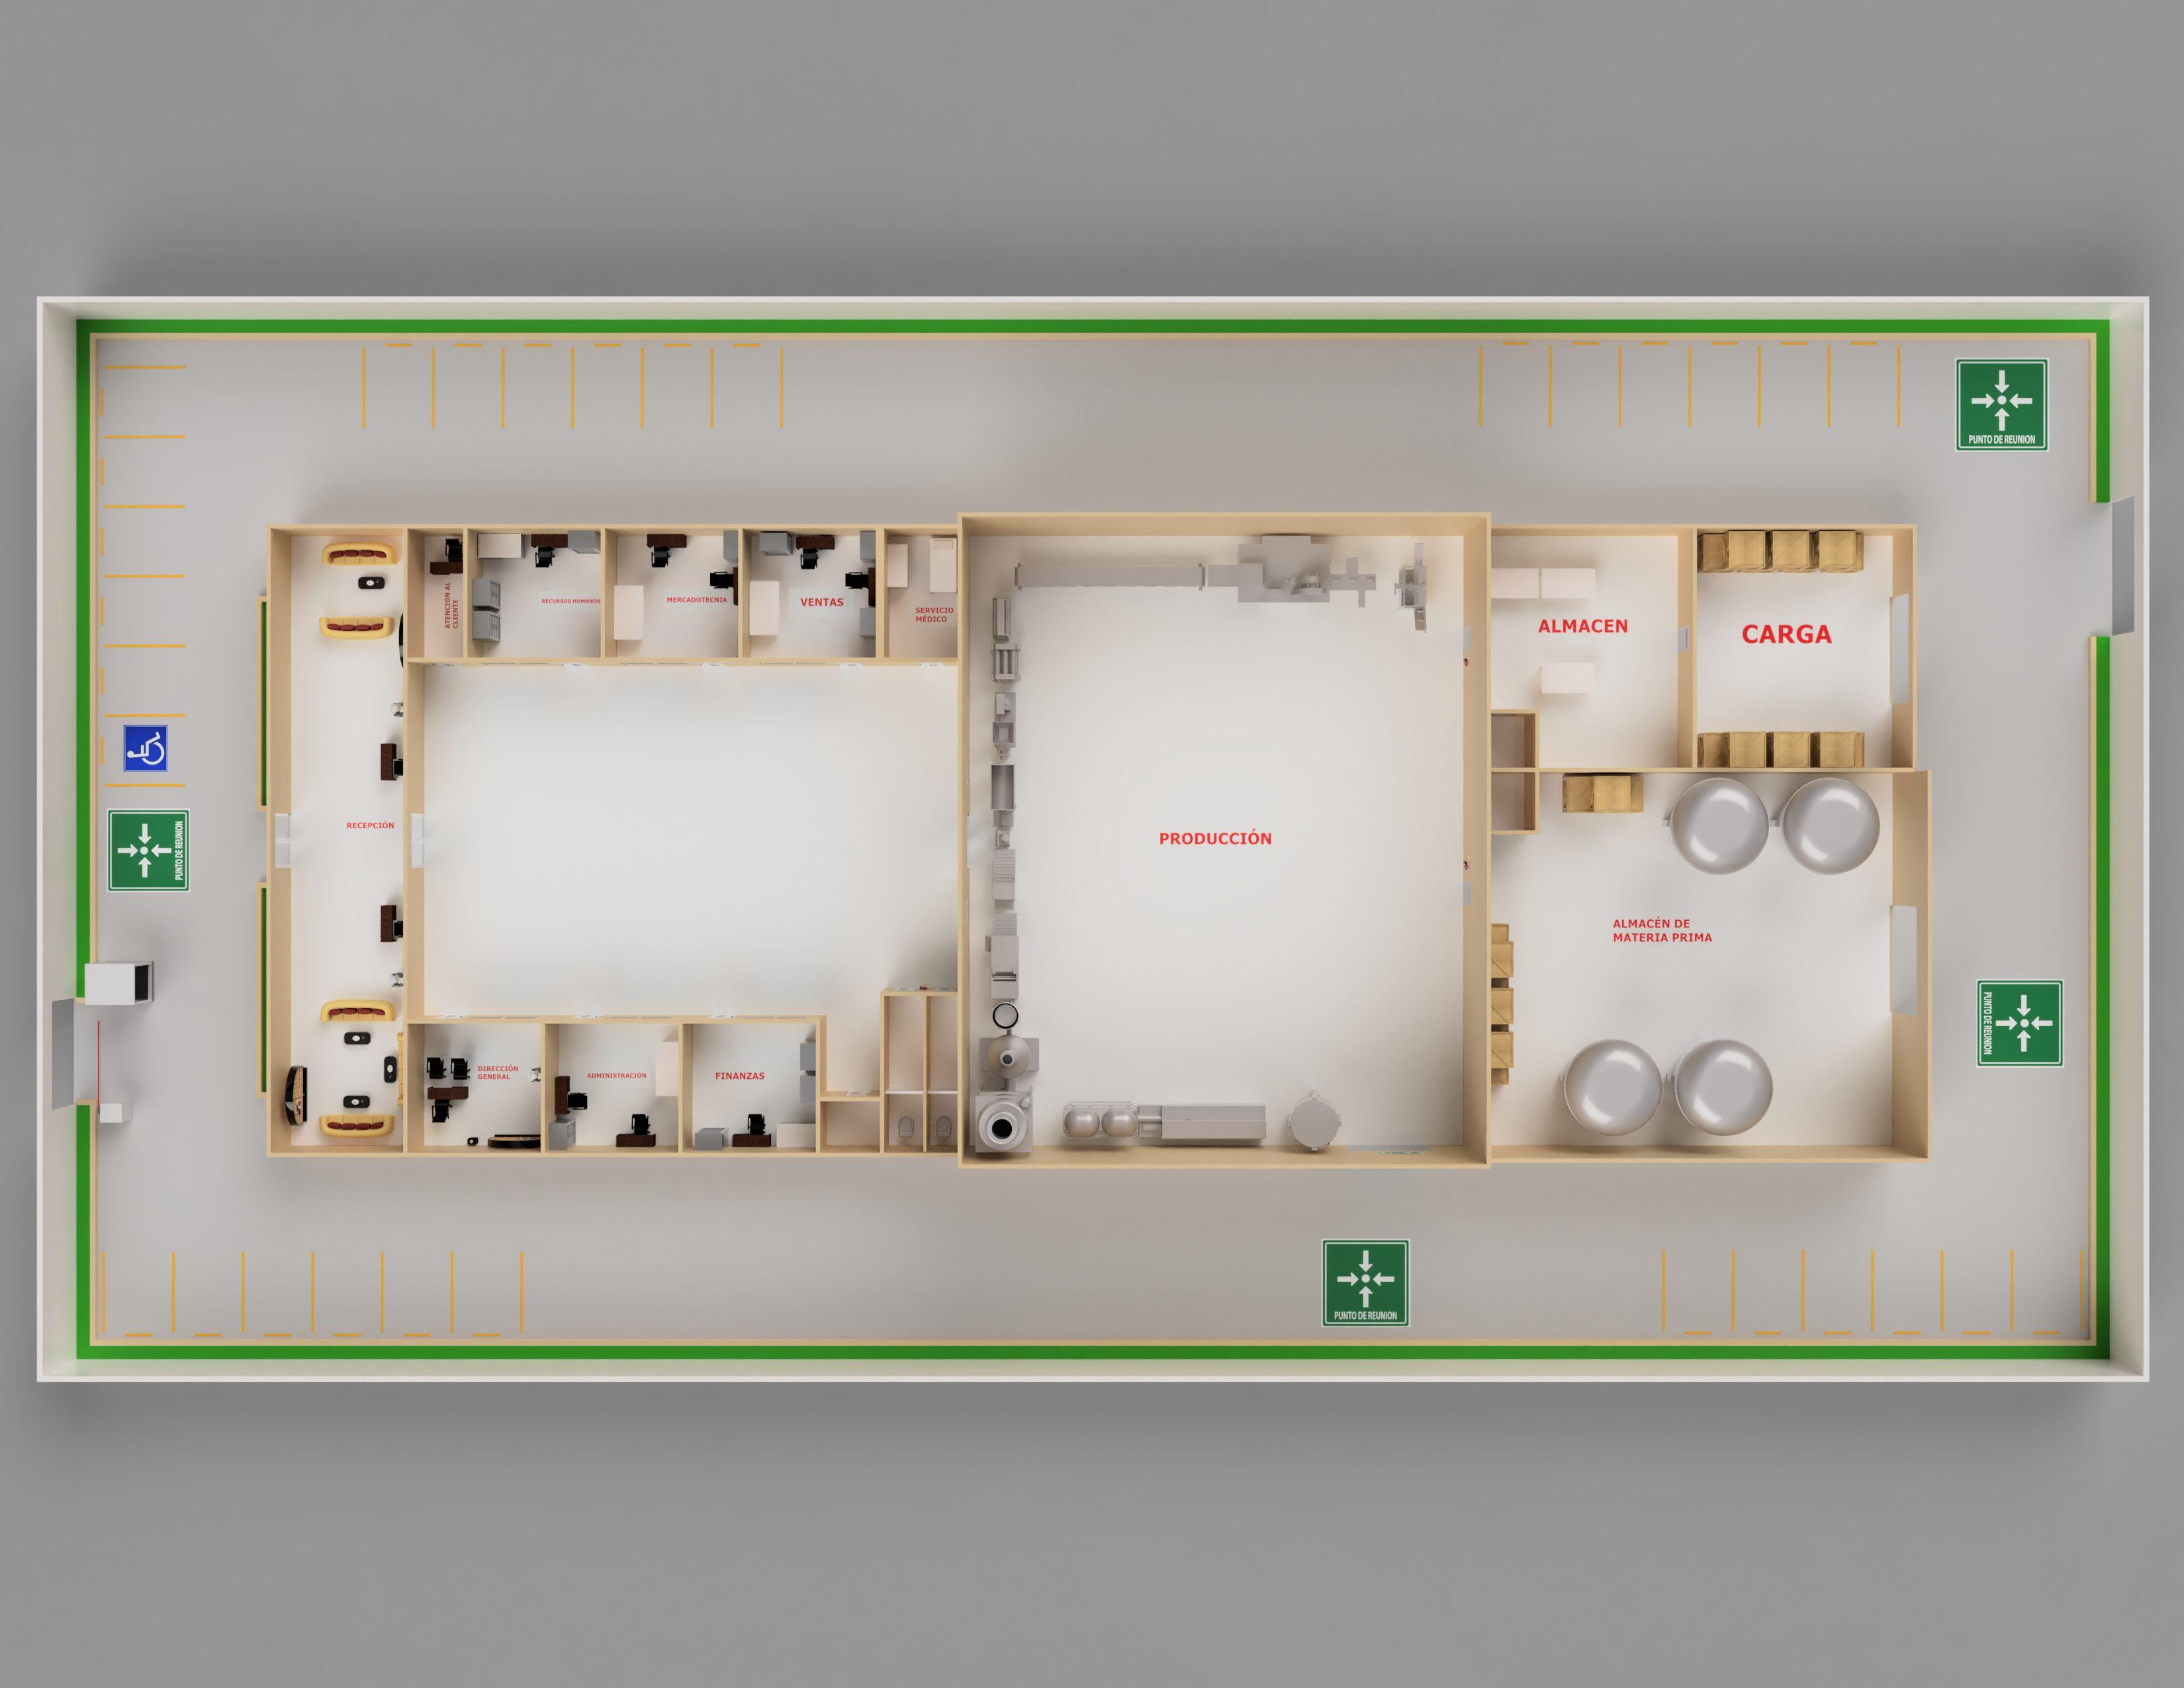 Fabrica-de-jabon-final-2019-dec-07-08-09-48pm-000-customizedview823155988-png-3500-3500